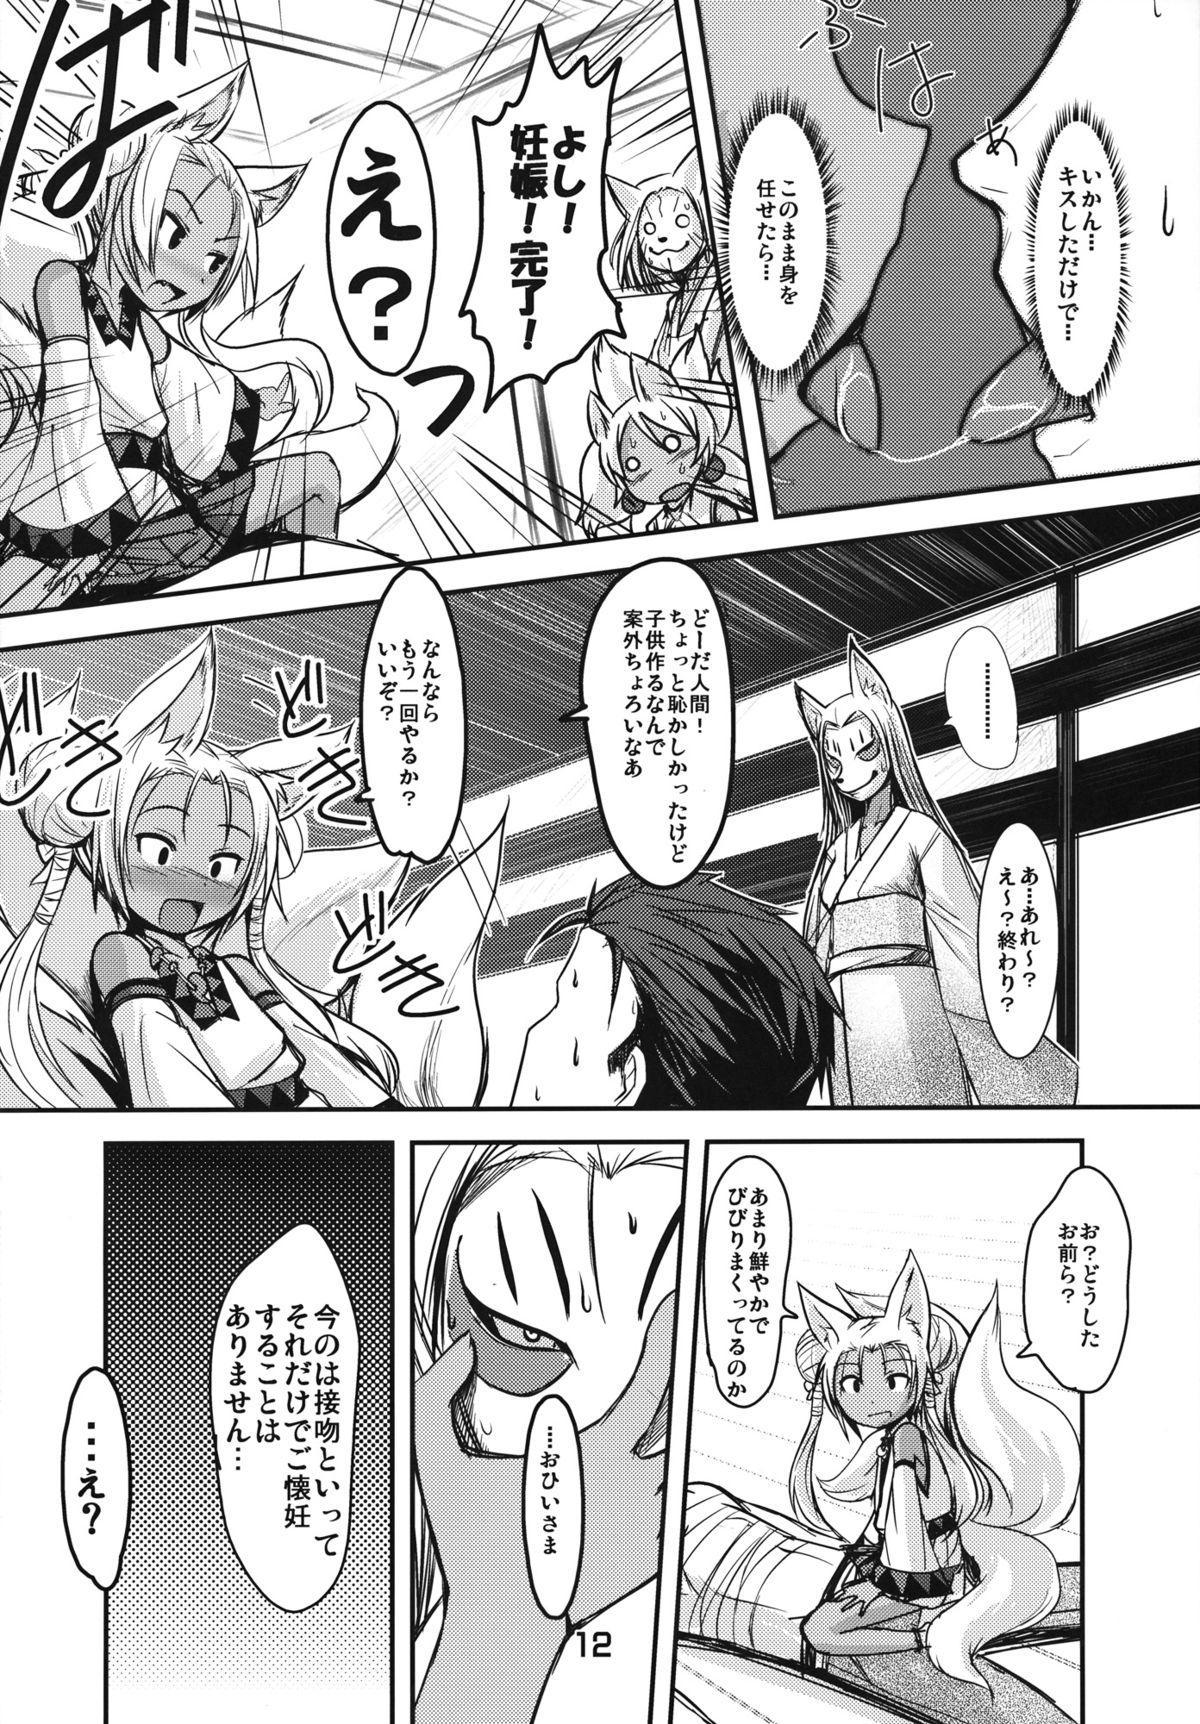 Souko no Tobari 10